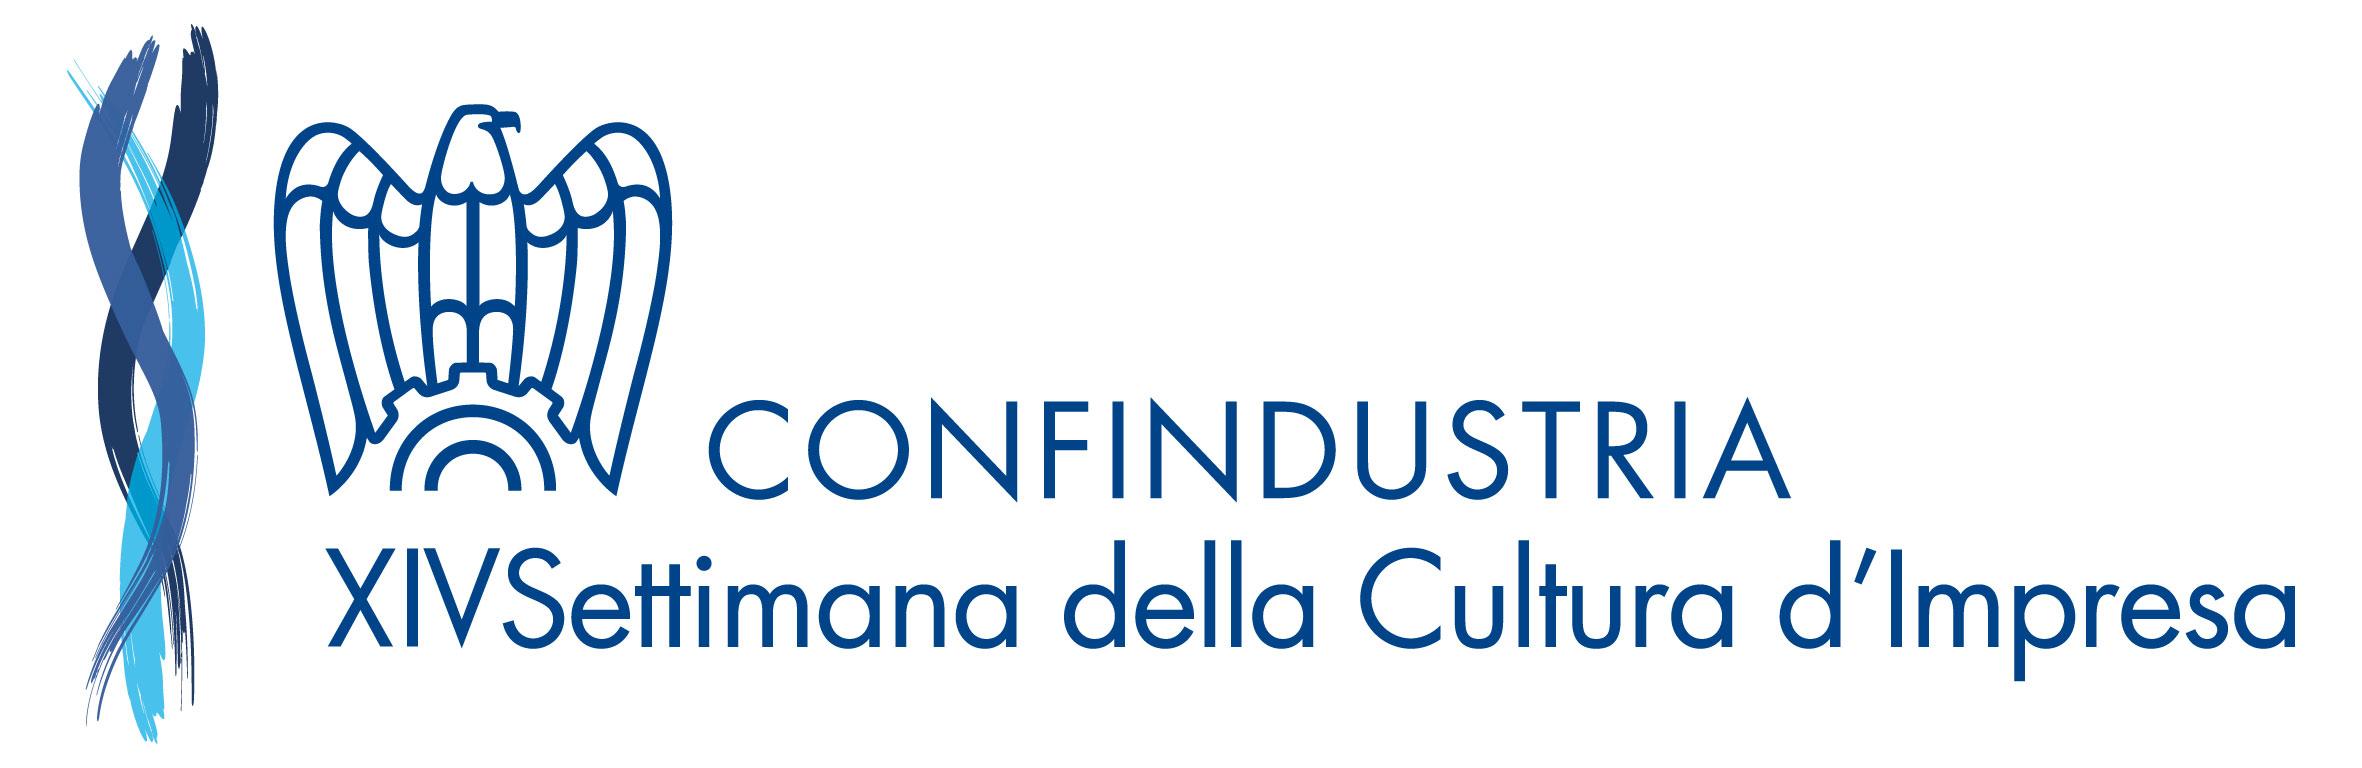 logo XIV settimanacultura